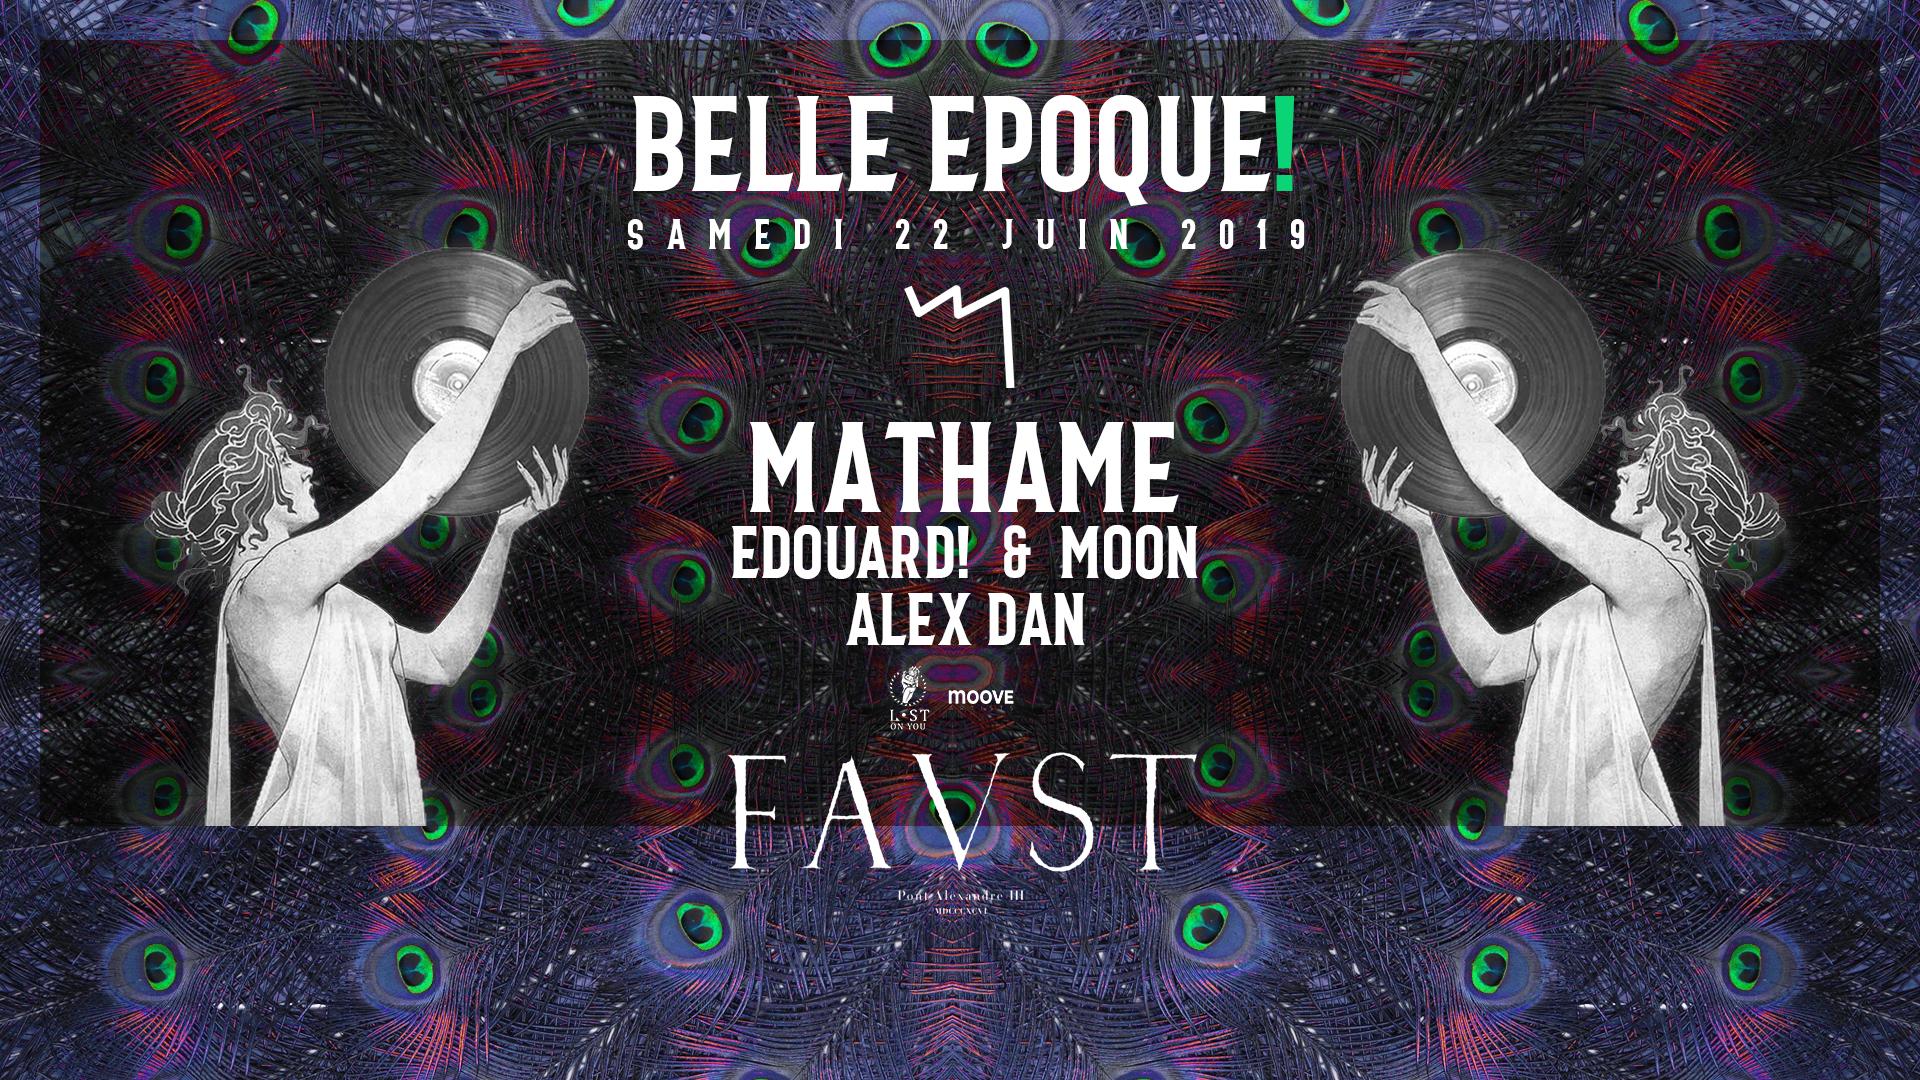 Faust — Belle Epoque! : Mathame, Edouard! & Moon, Alex Dan